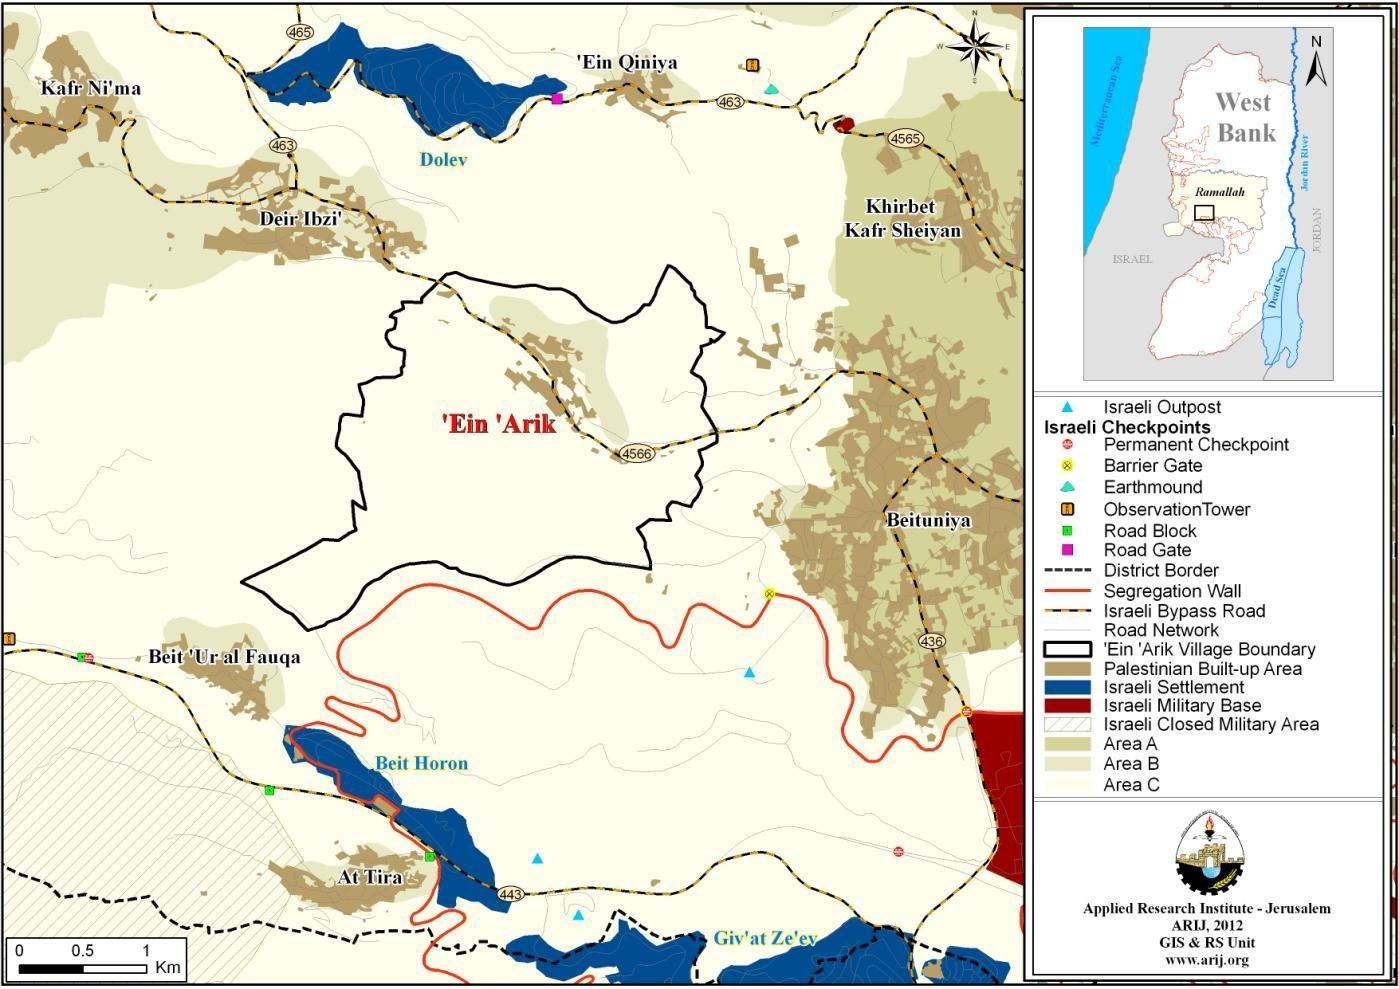 Ayn Arik Village Boundary 2